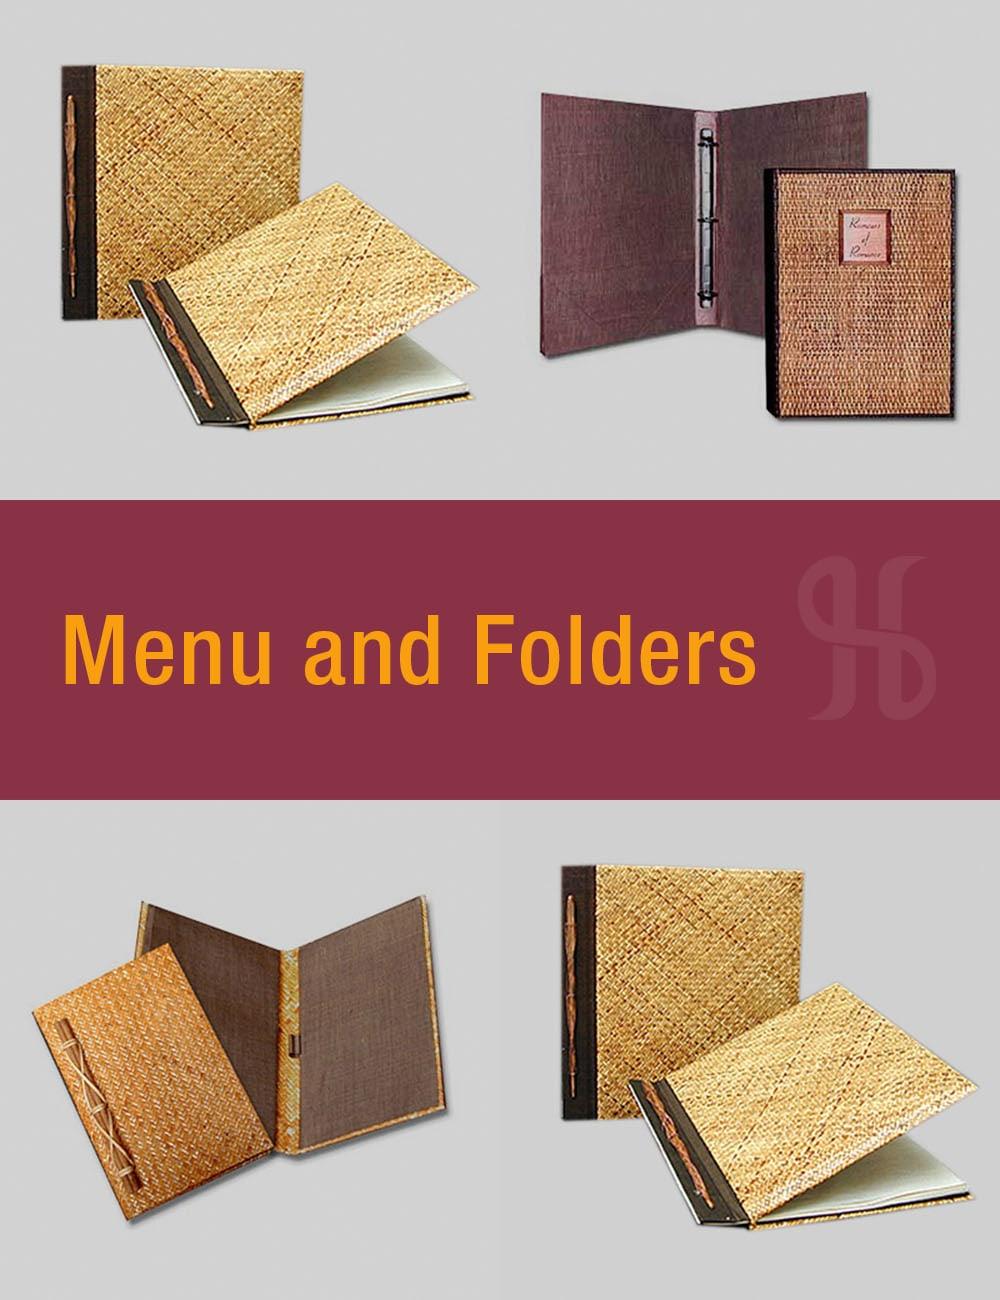 Menu and Folders